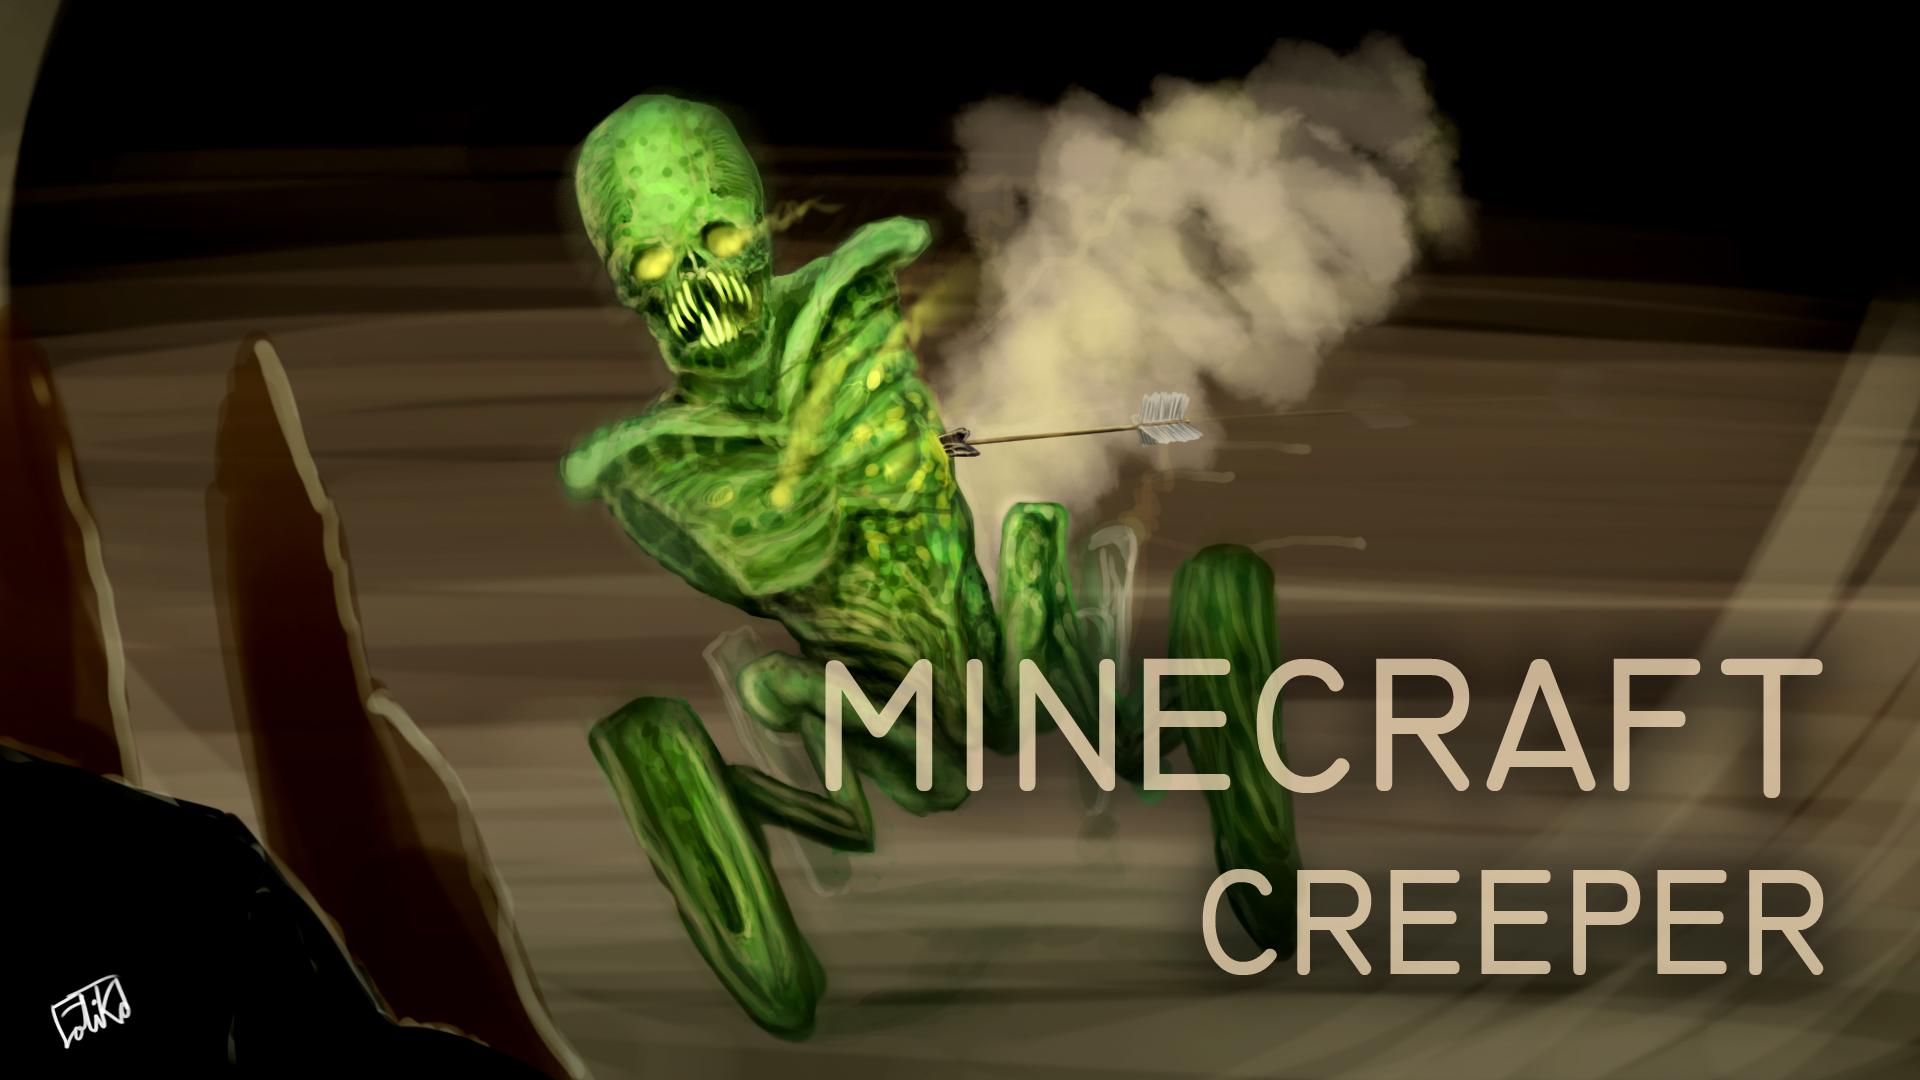 Minecraft Creeper In Real Life Minecraft - creeper art